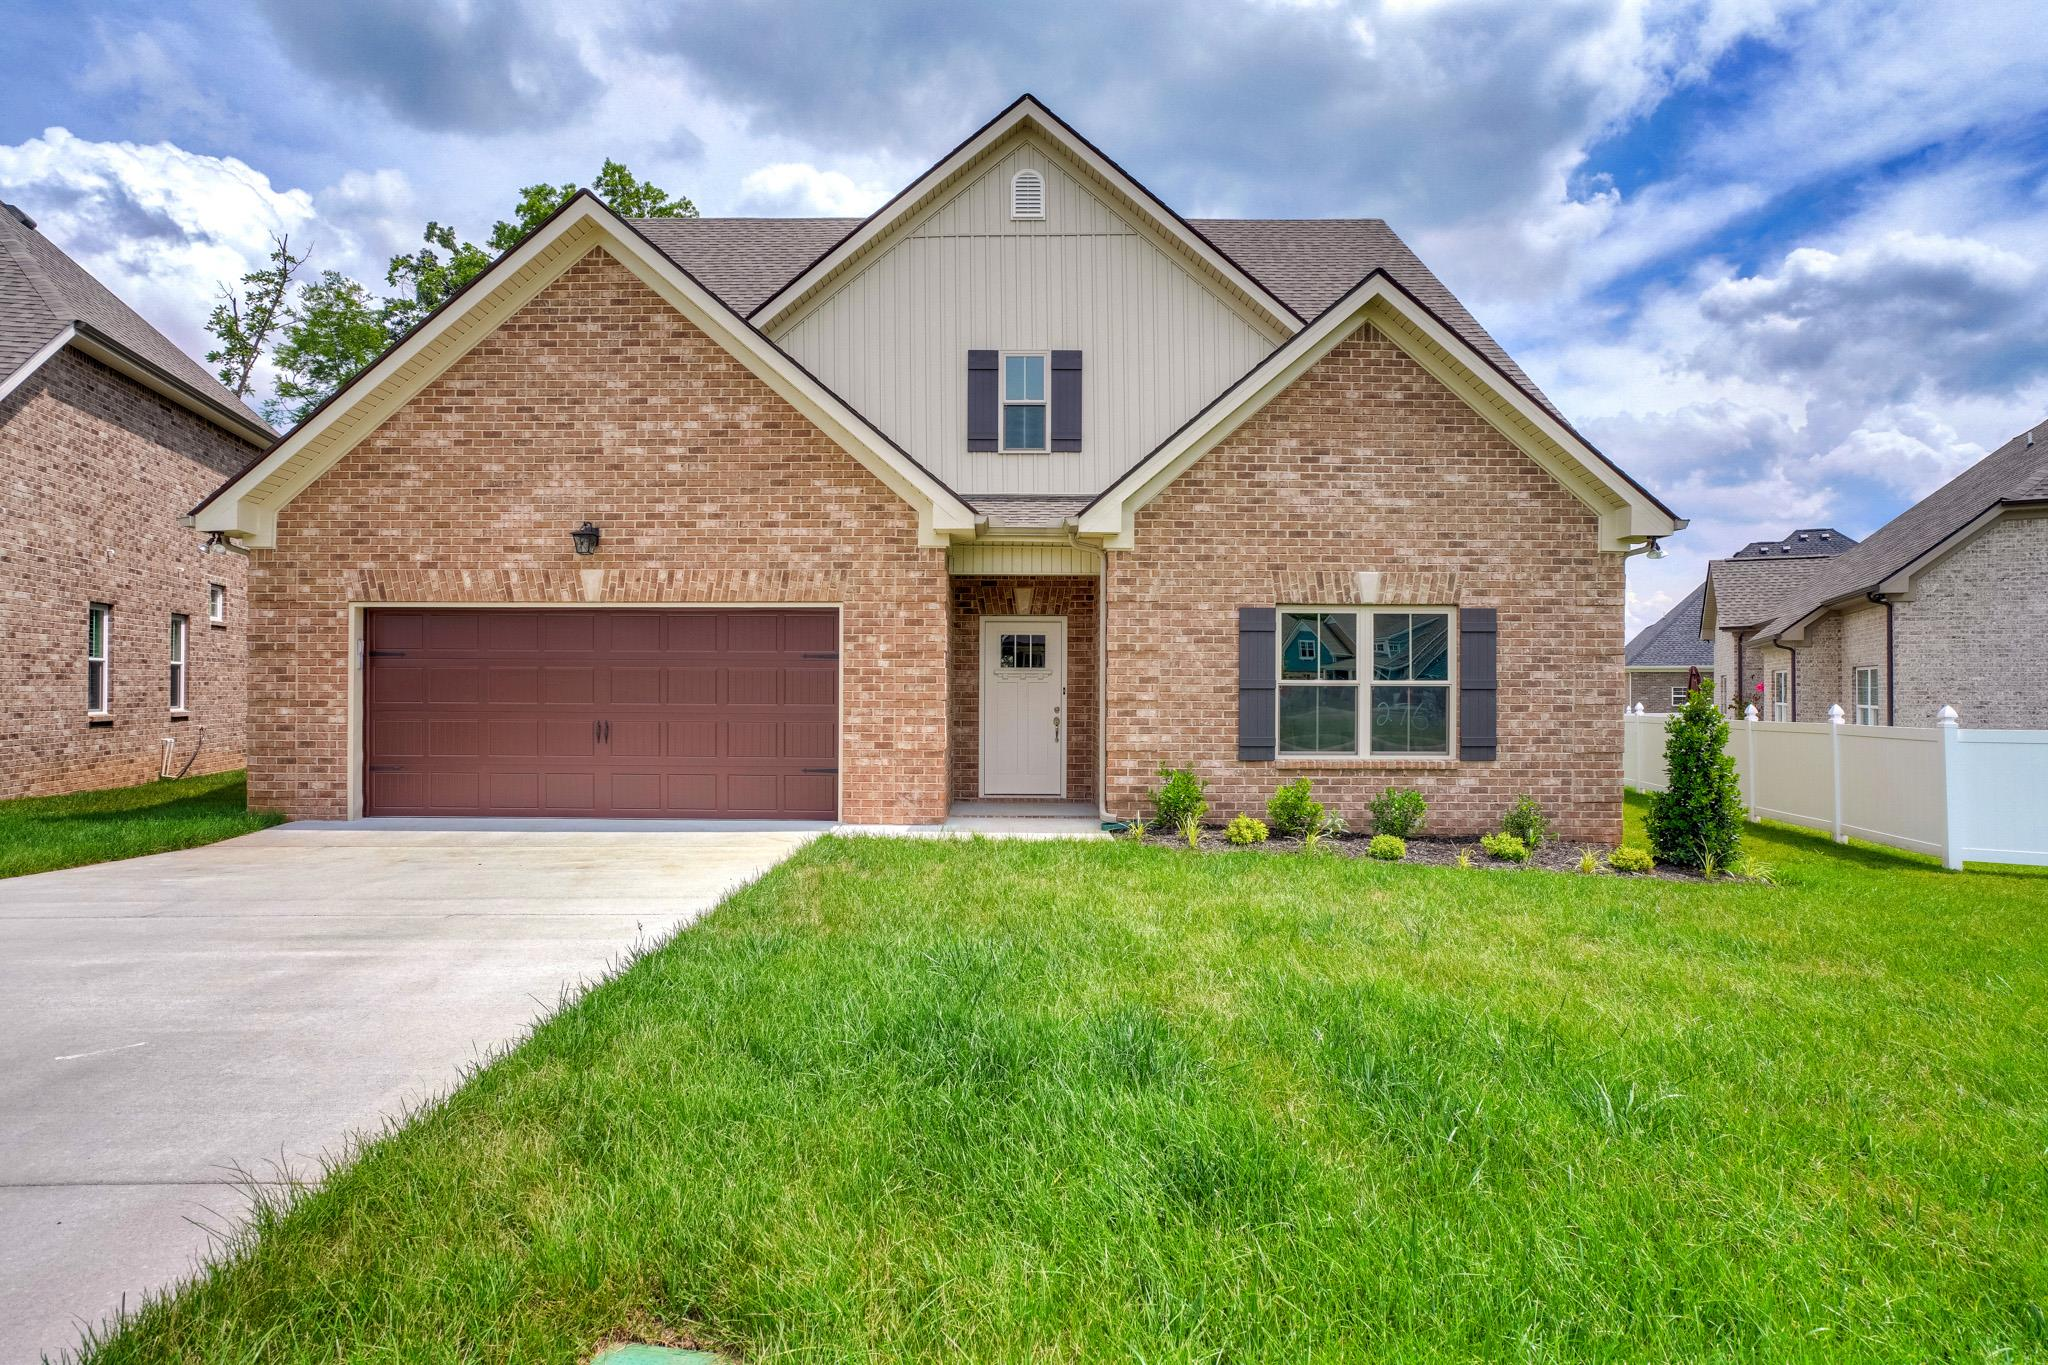 1208 Hensfield Drive, Murfreesboro, TN 37128 - Murfreesboro, TN real estate listing